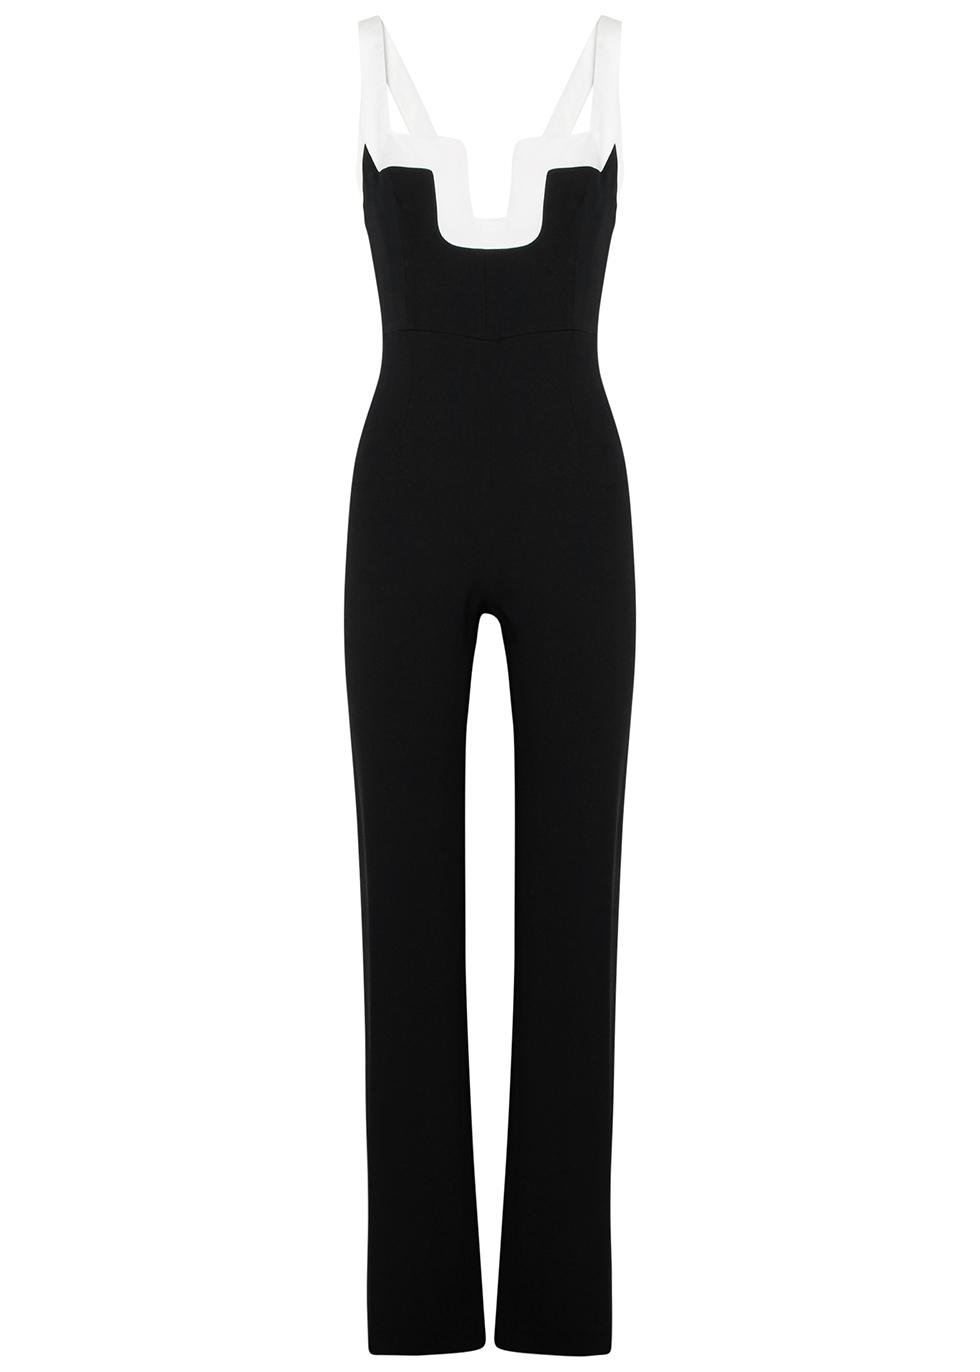 Arabesque Monochrome Straight-Leg Jumpsuit in Black And White